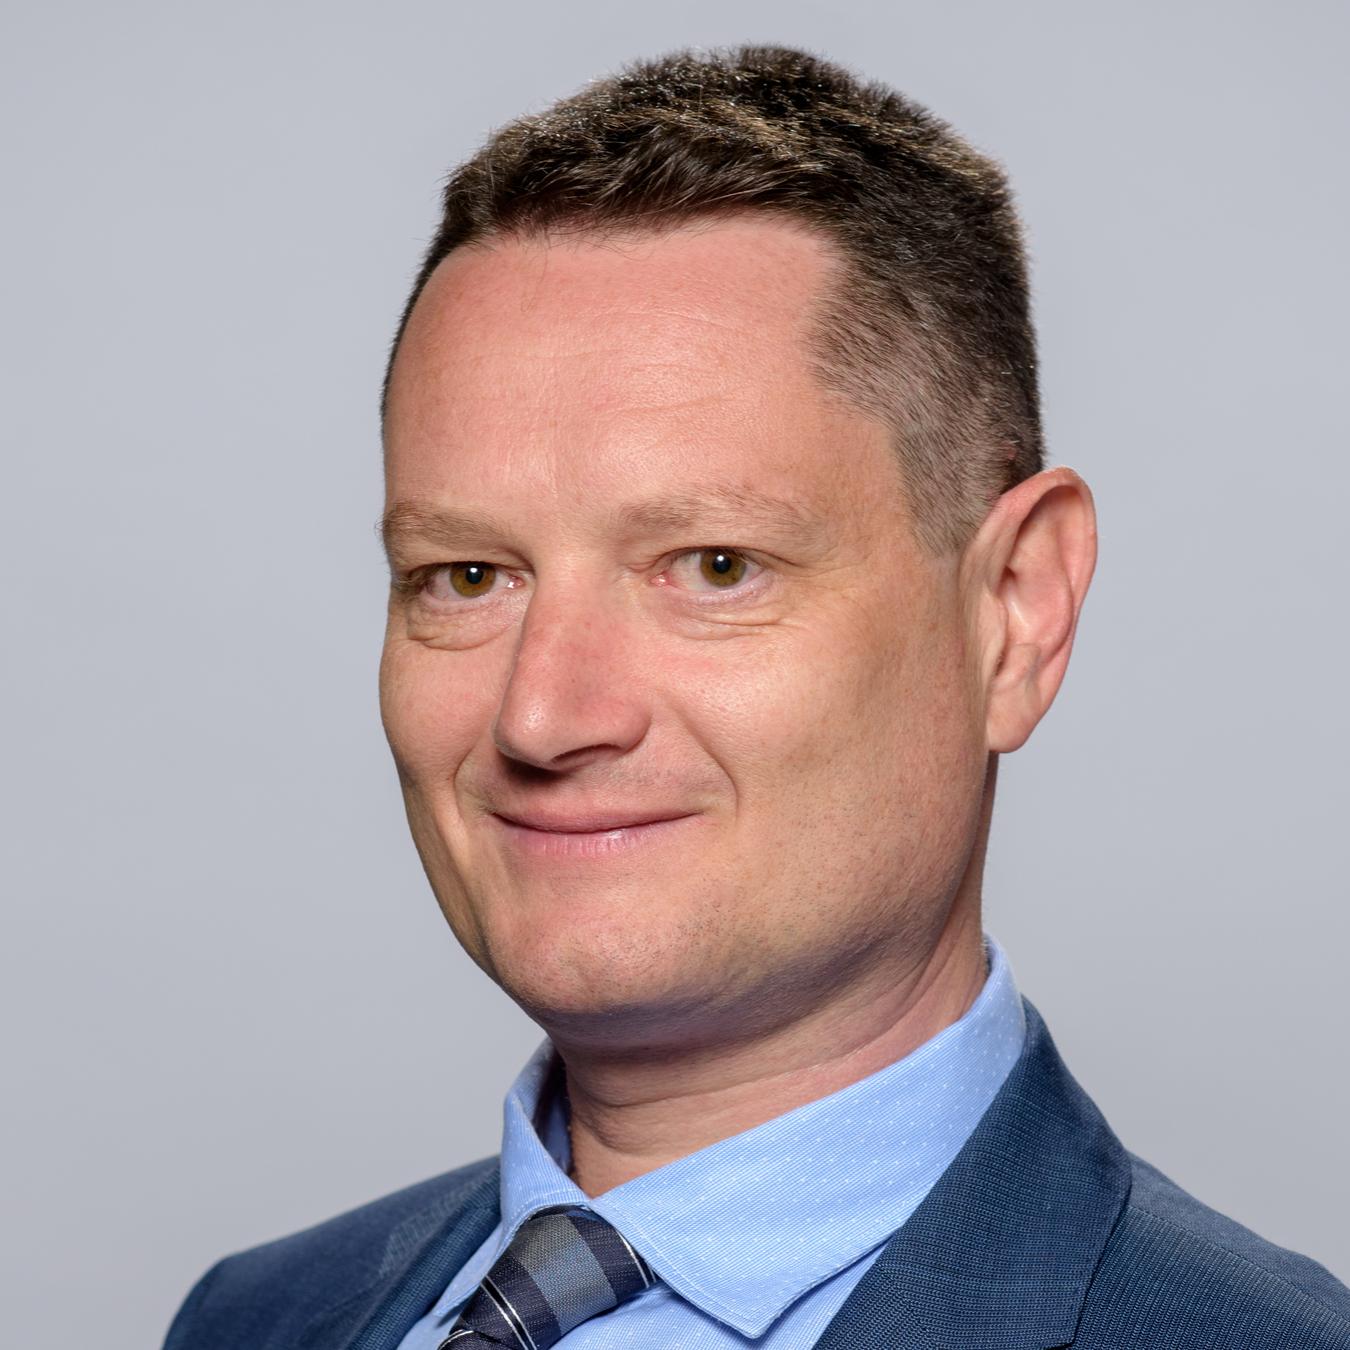 Борис Паков